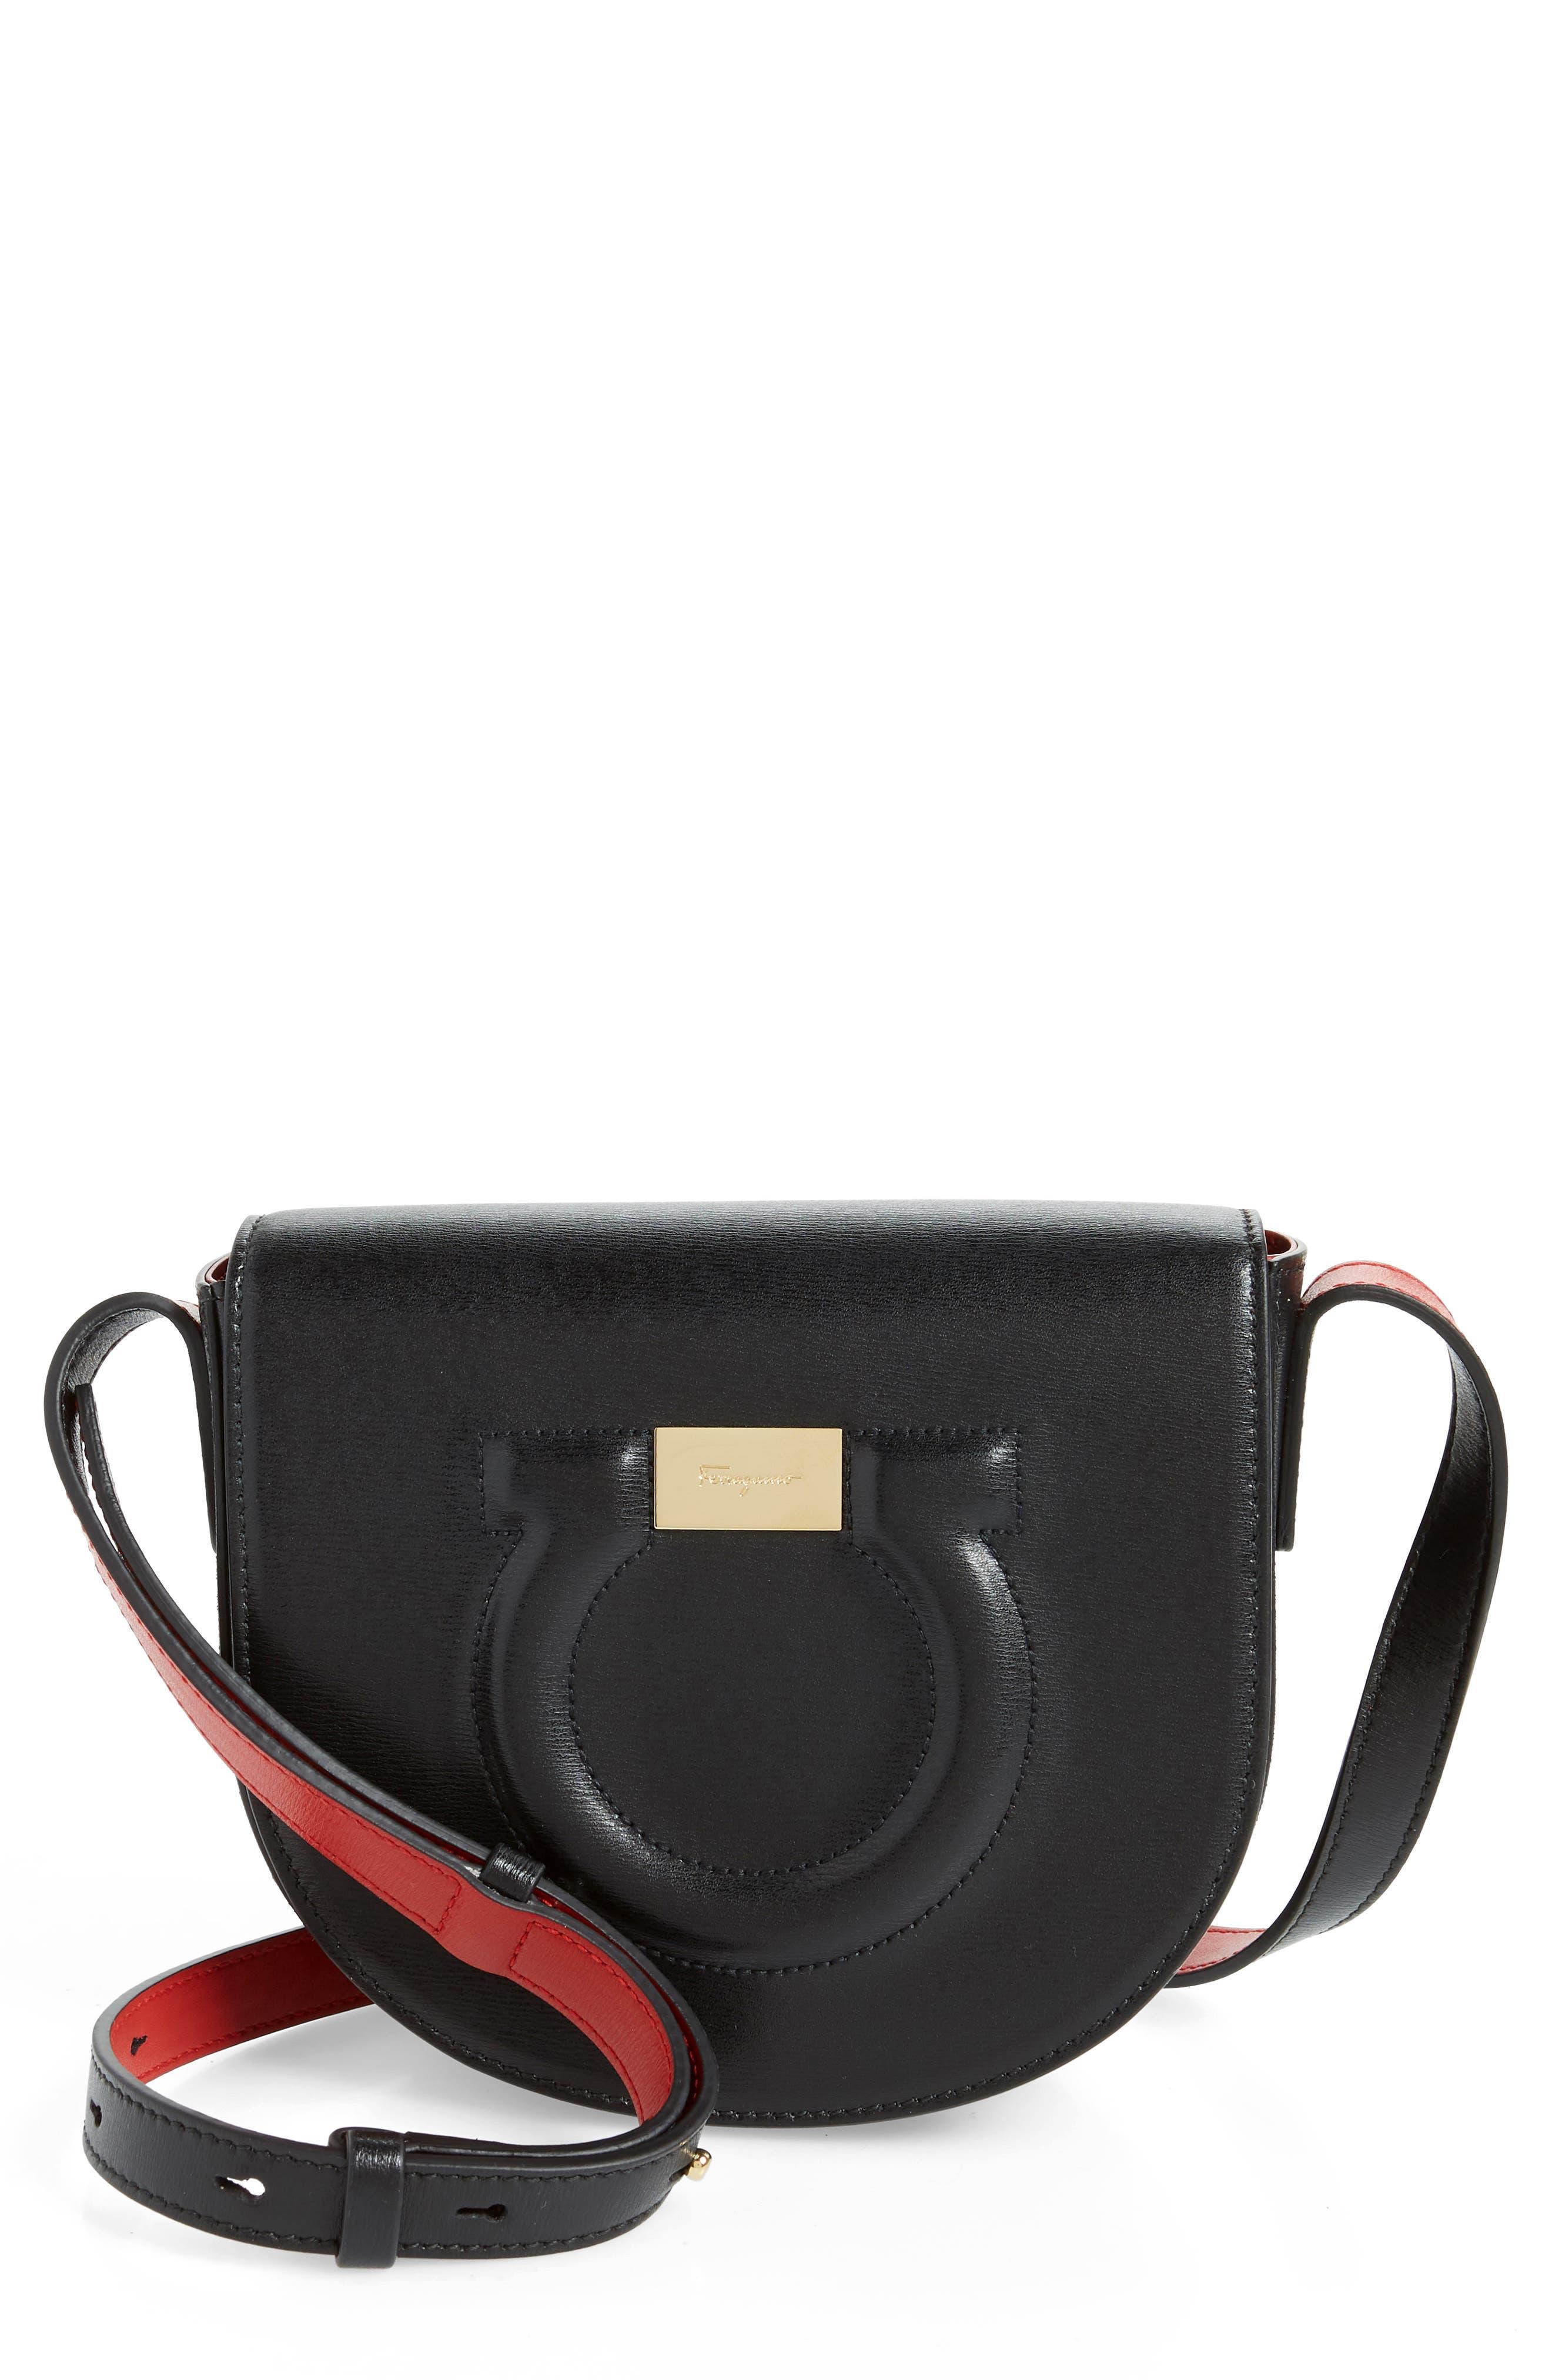 534d36f2dc Salvatore Ferragamo Quilted Gancio Crossbody Bag - Black